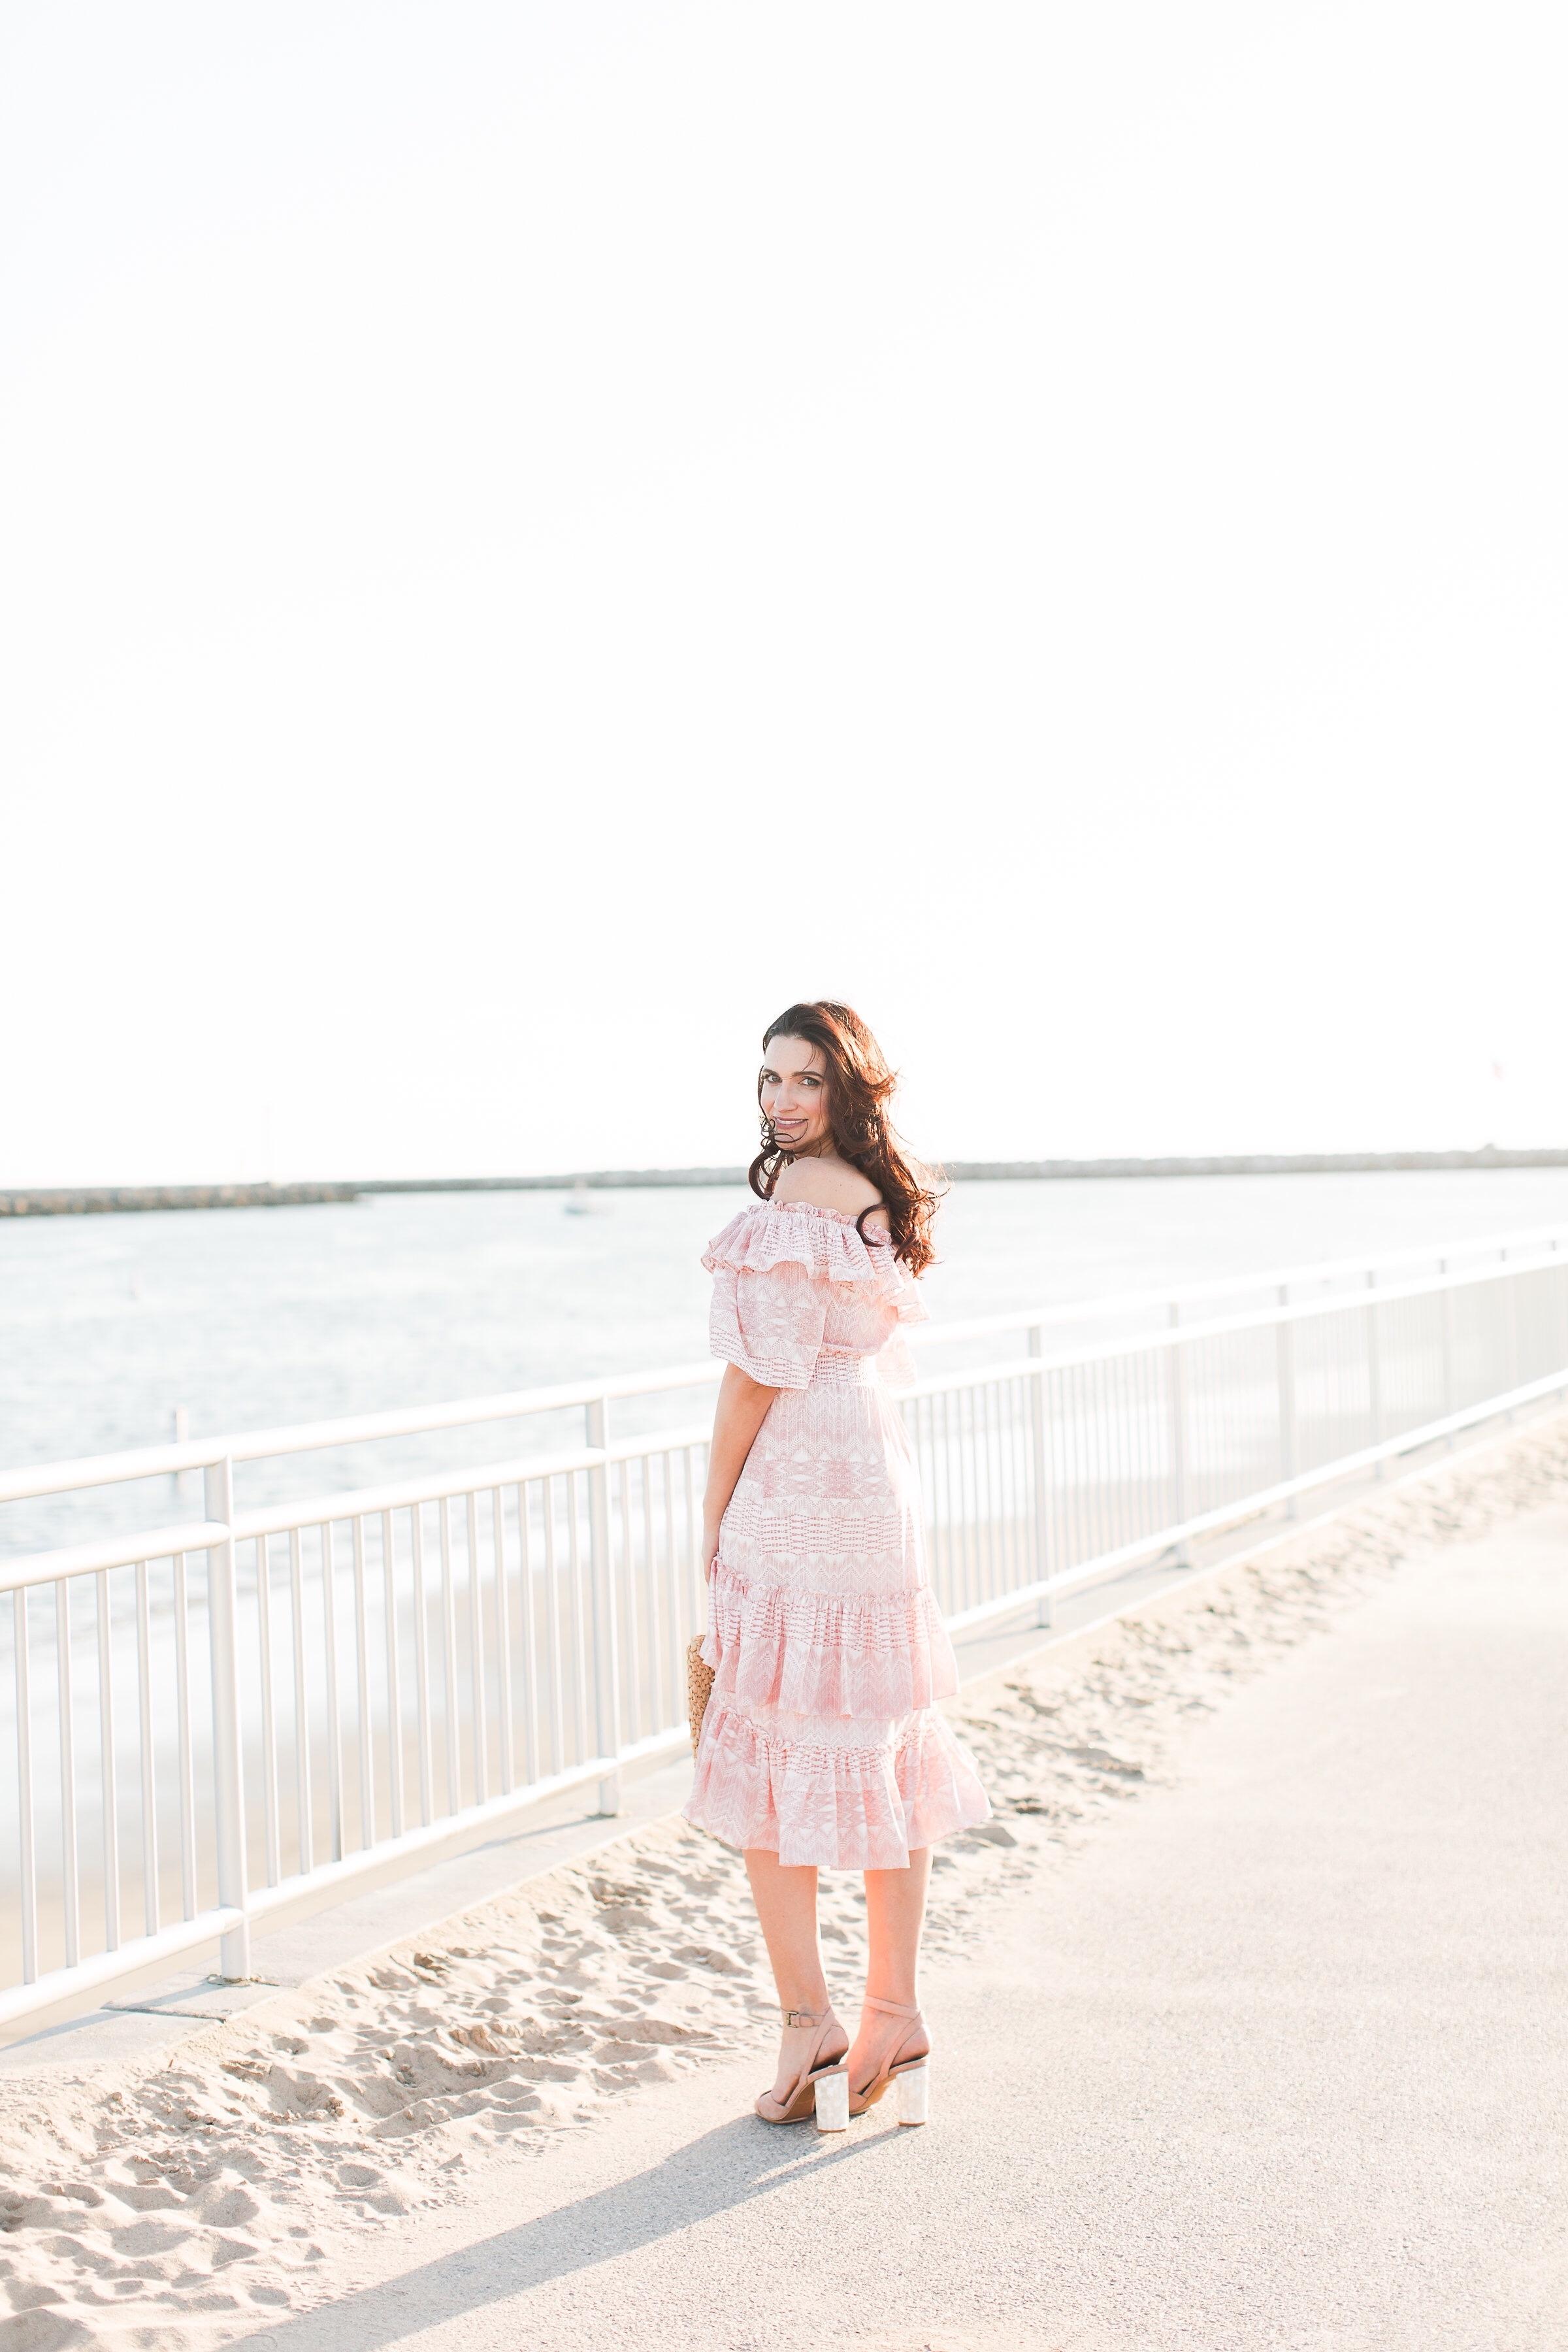 beach dress 2 _edit.JPEG